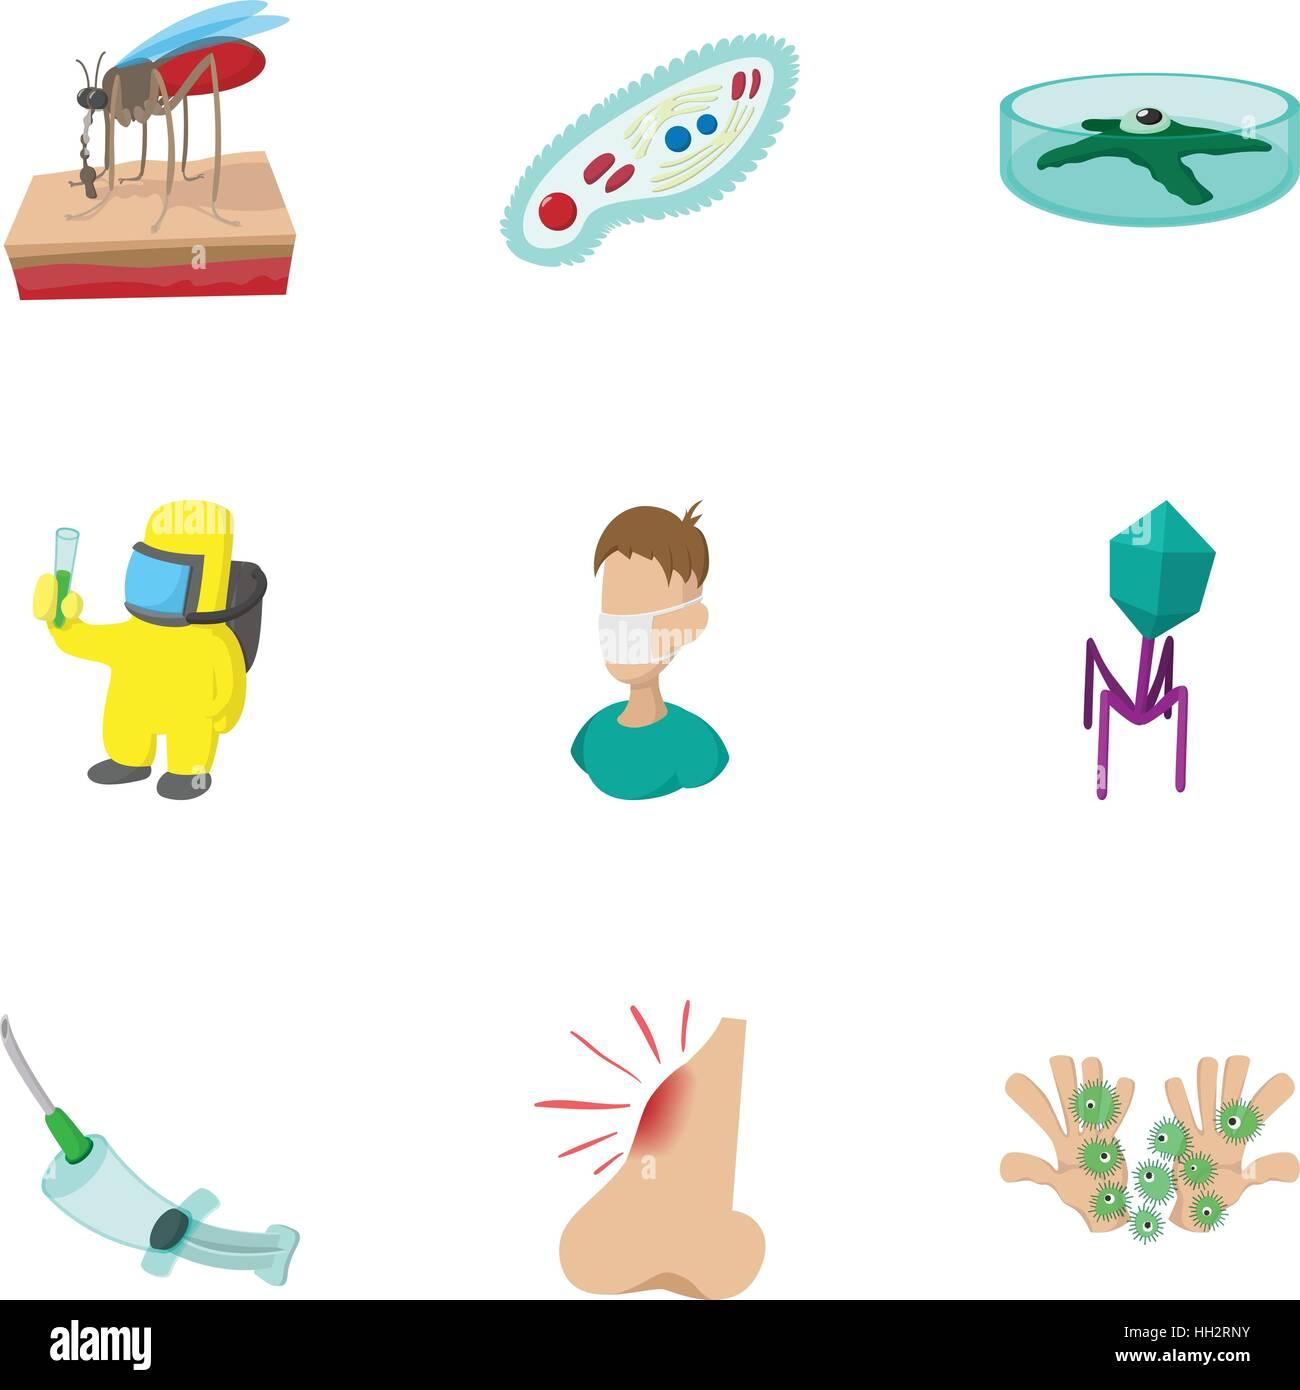 Symptoms of malaria icons set, cartoon style - Stock Image